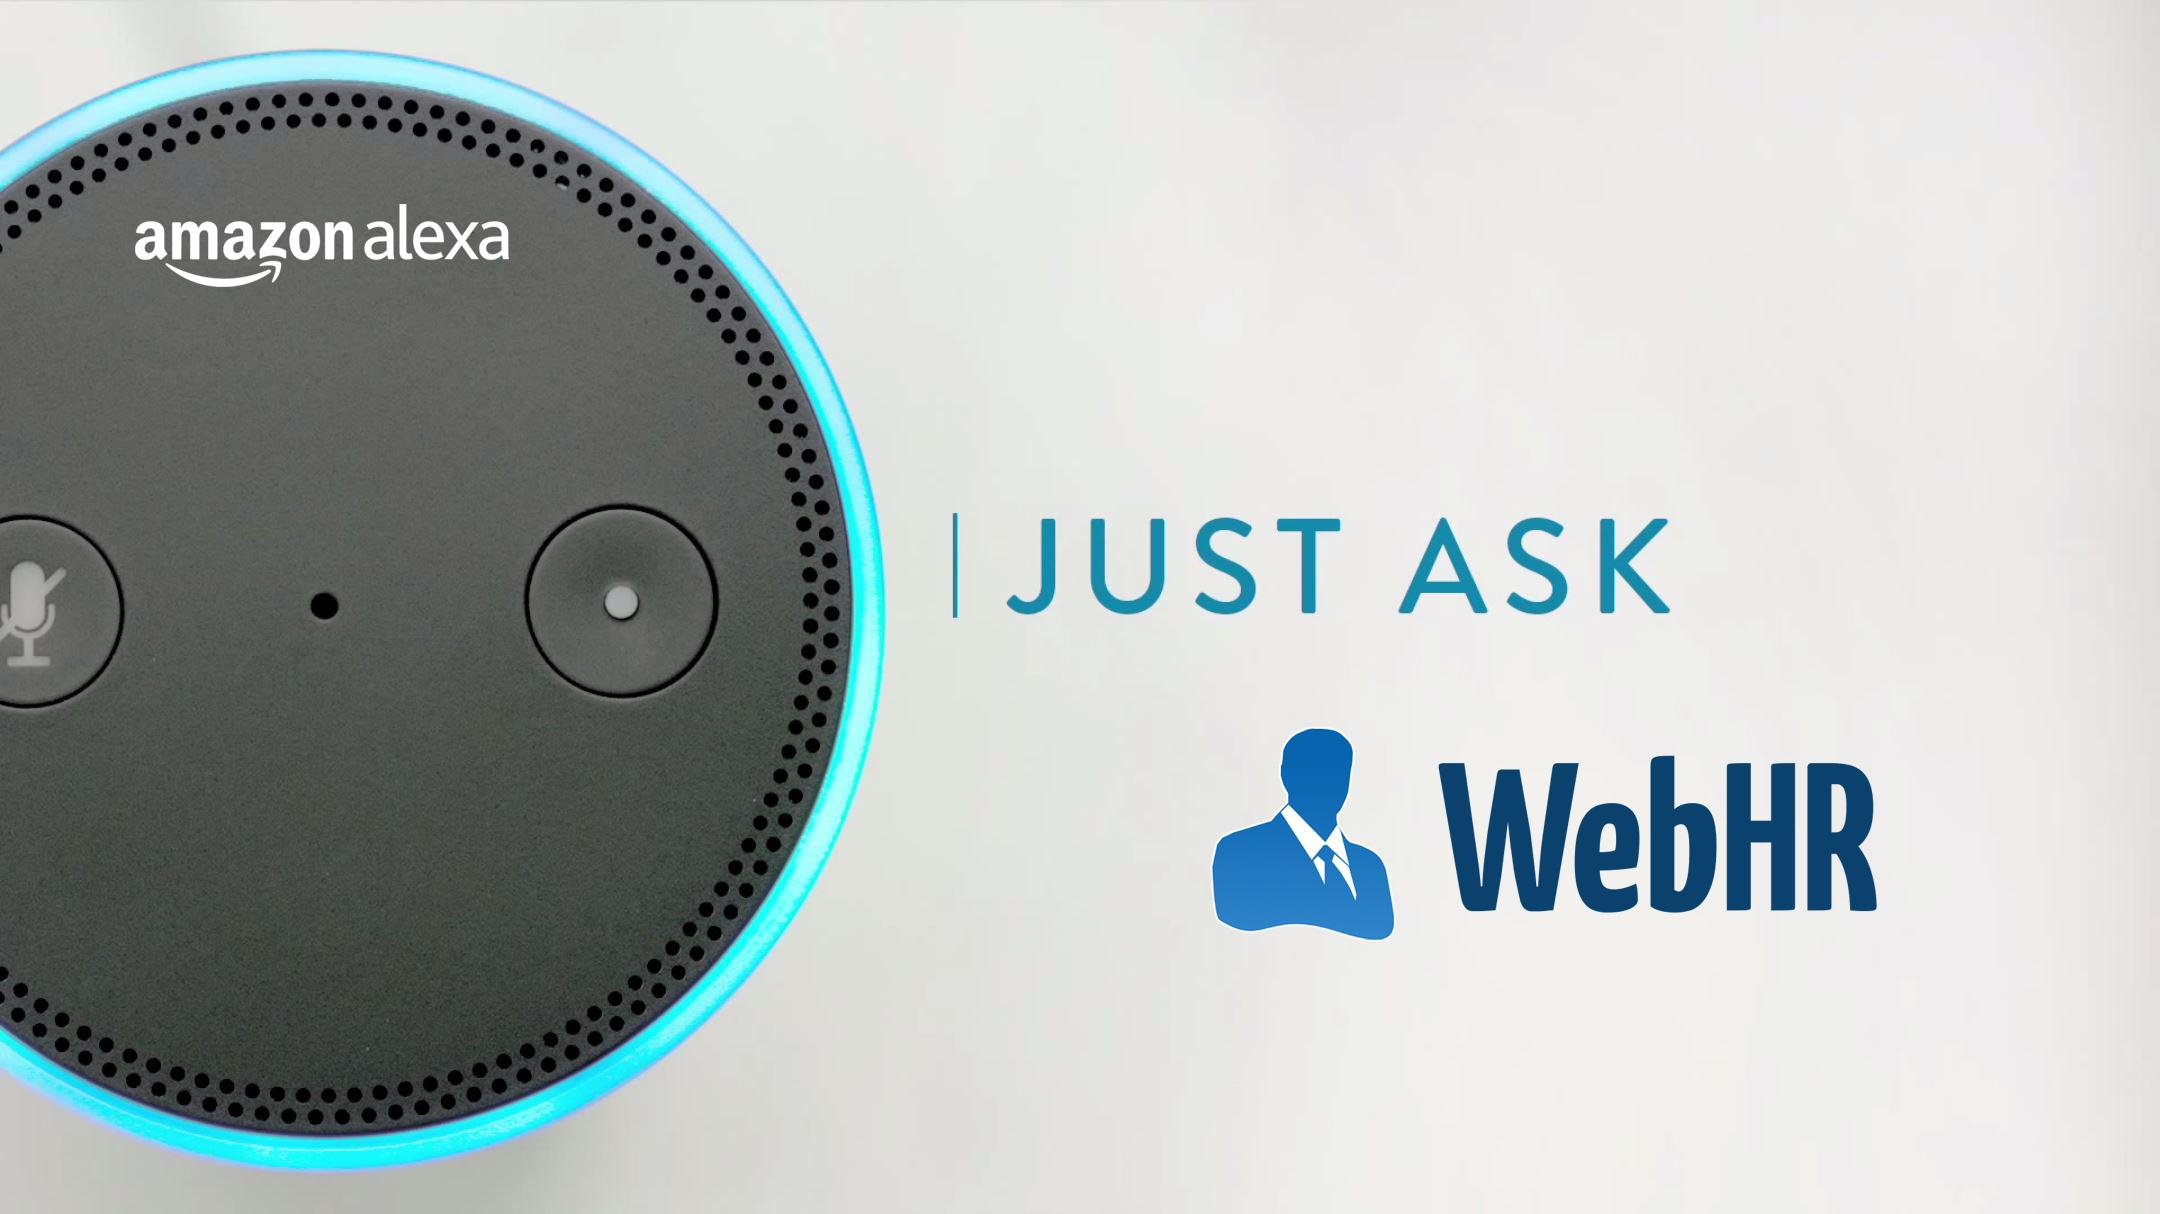 Just ask WebHR